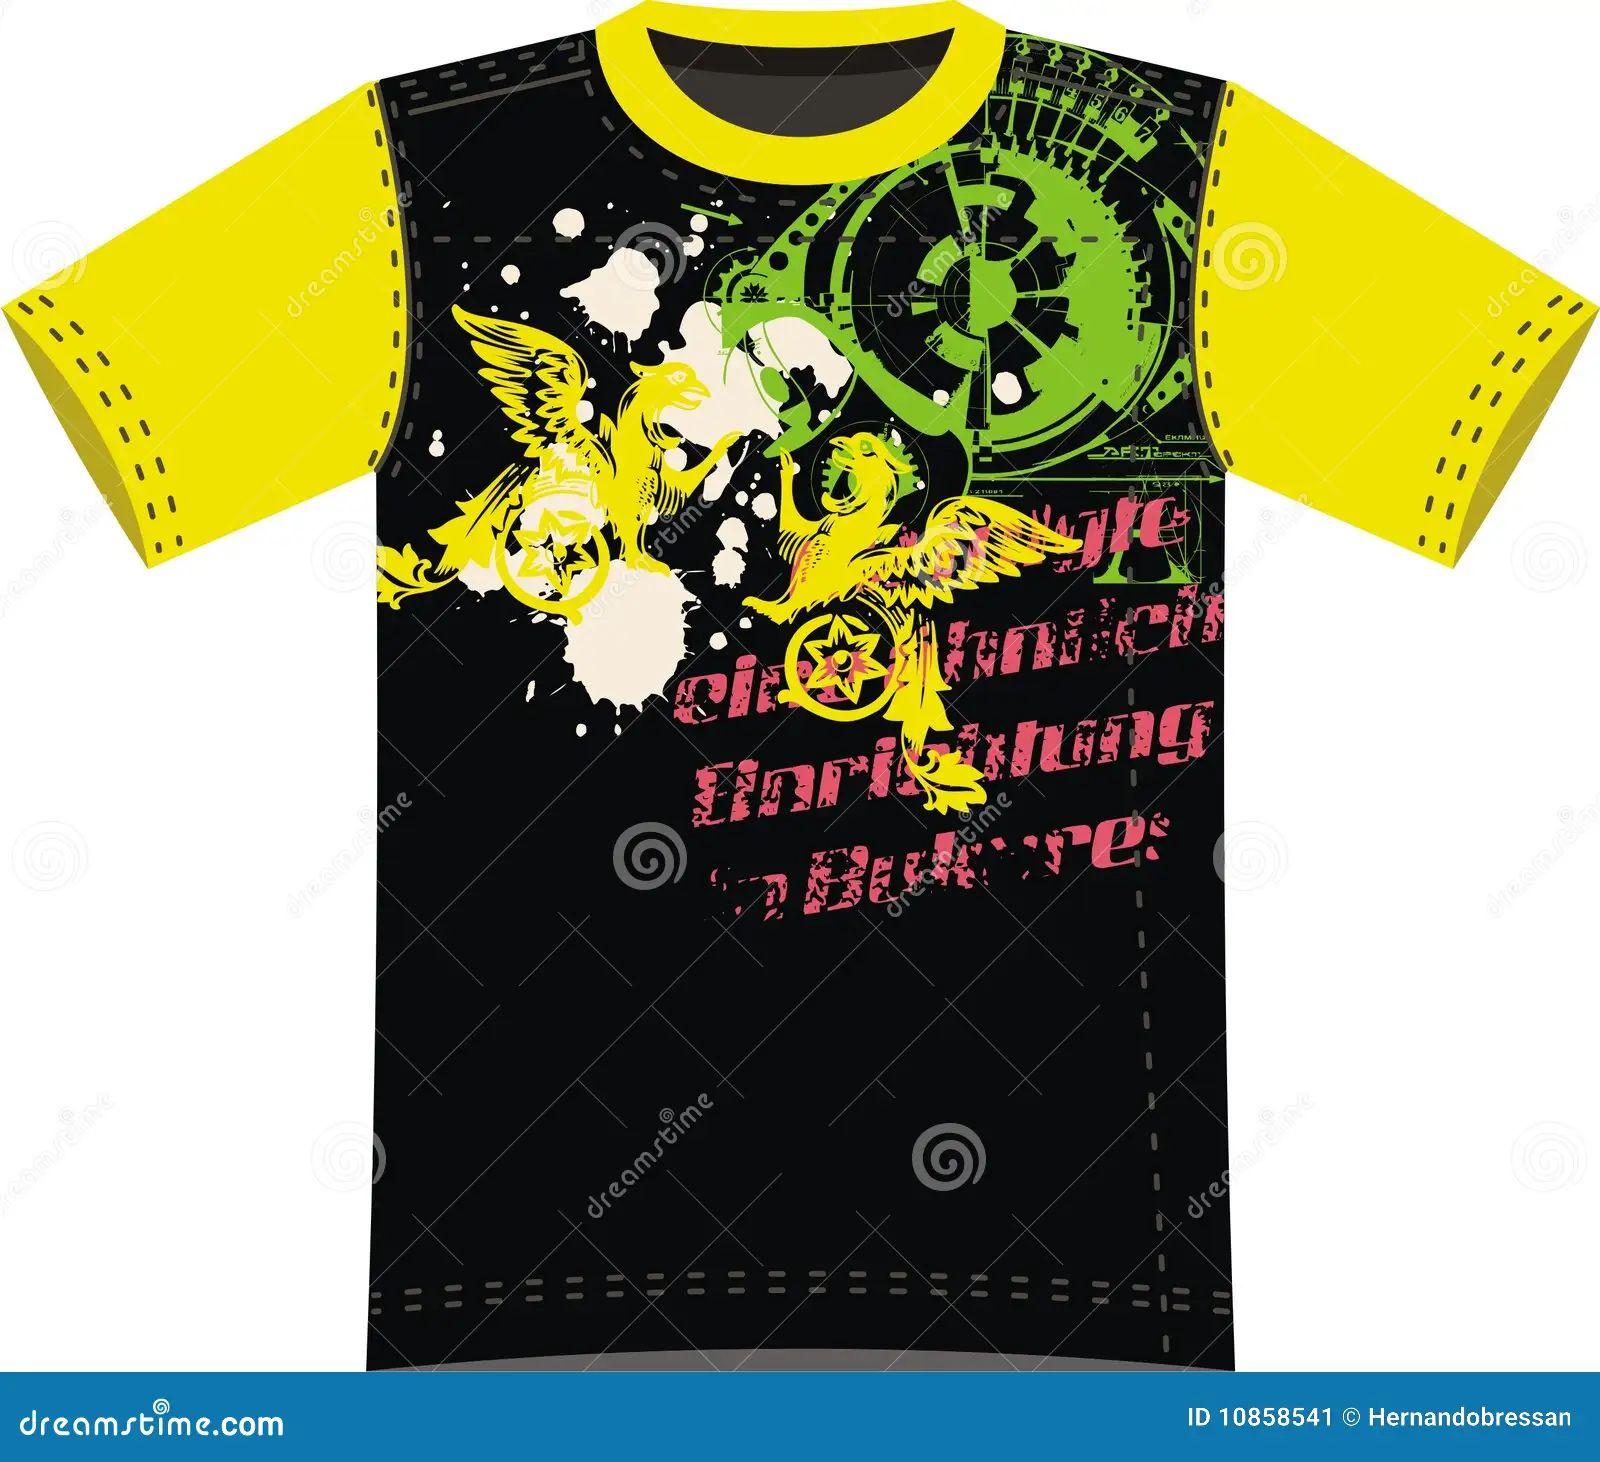 Desain t shirt jkt48 - Desain T Shirt Jkt48 Jkt48 Abstract Design Dragon Fly Oriental Shirt Silk T Cdr Download